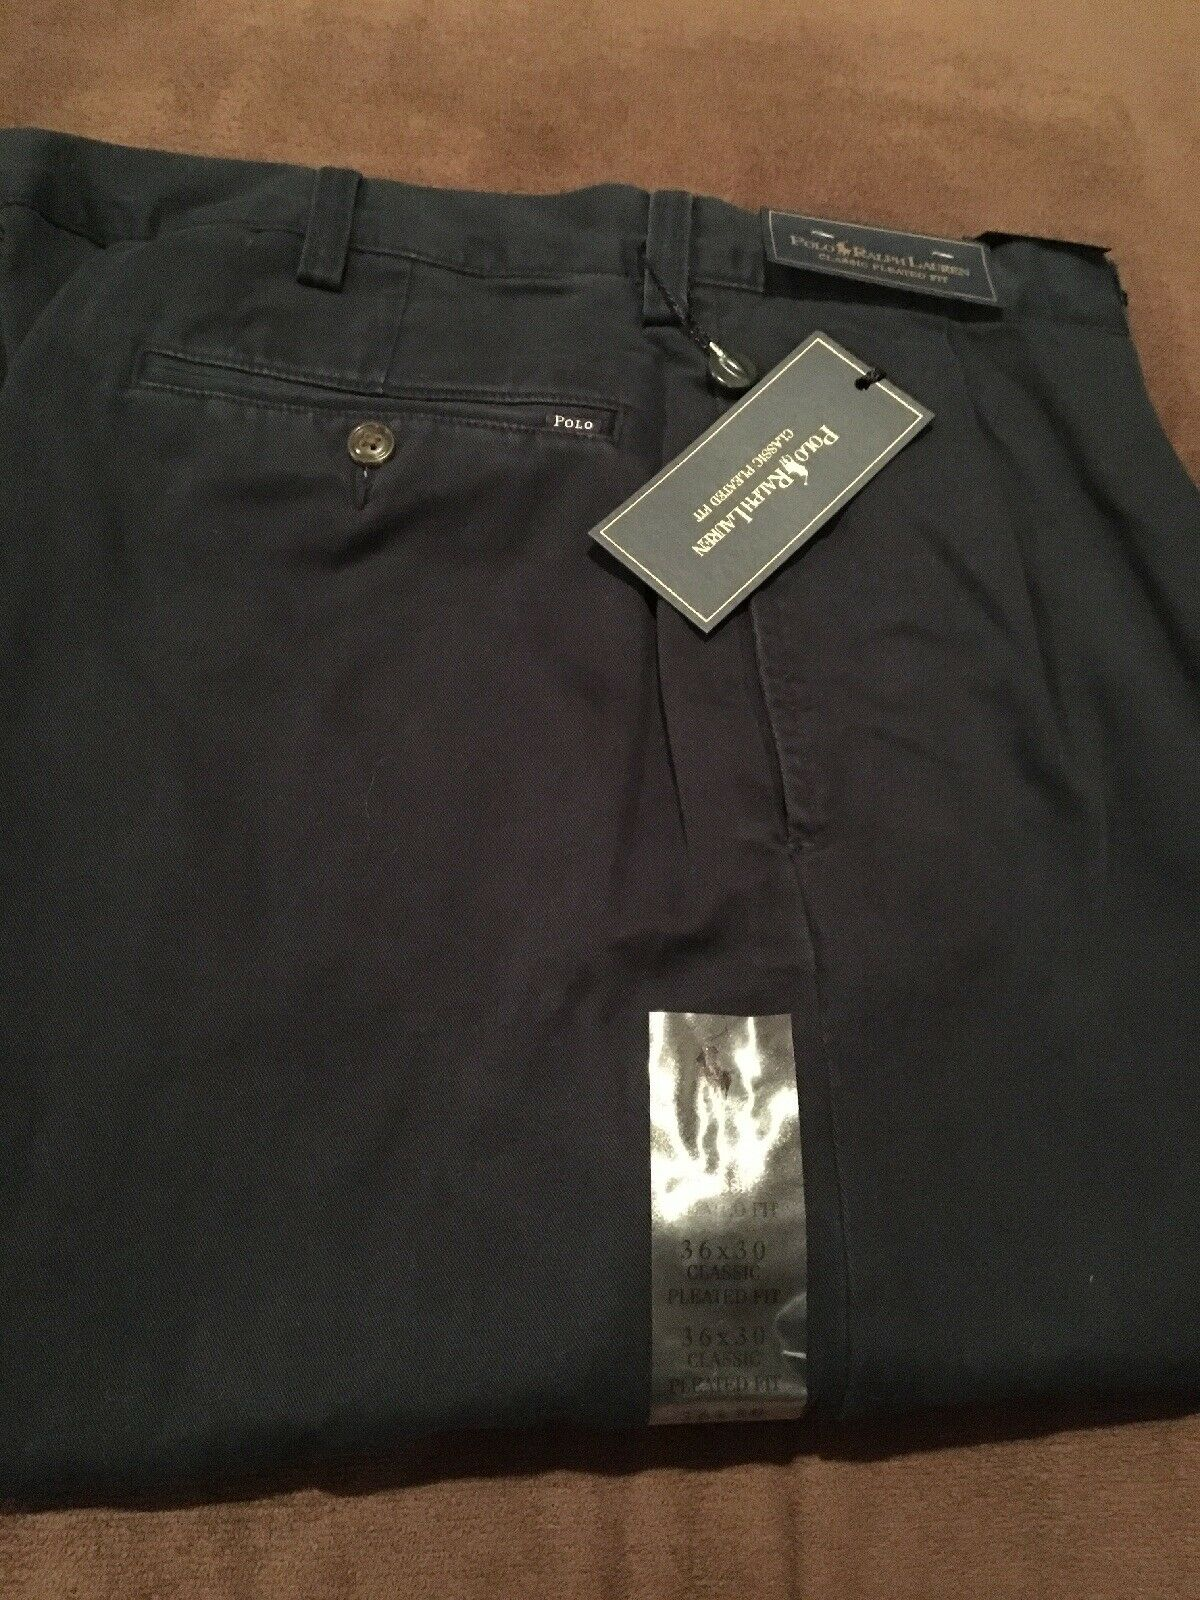 POLO RALPH LAUREN Premium Classic Pleated Navy Khaki Pants NWT 36x30 Brand New